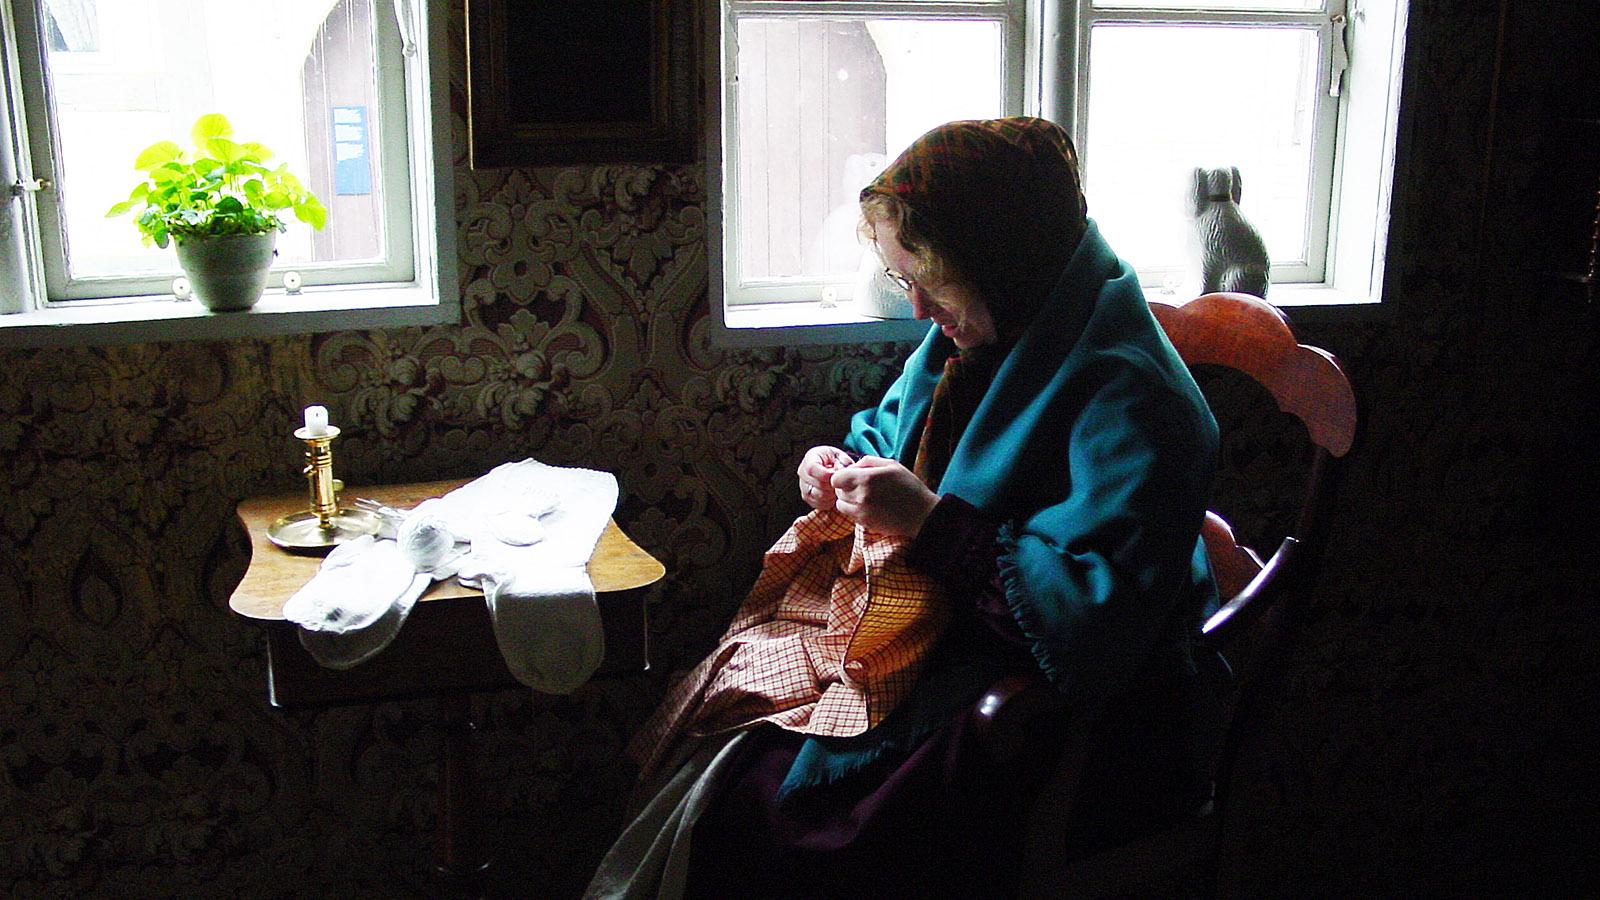 Wie in Großmutters Zeiten: Den Gamle By. Foot: Hilke Maunder